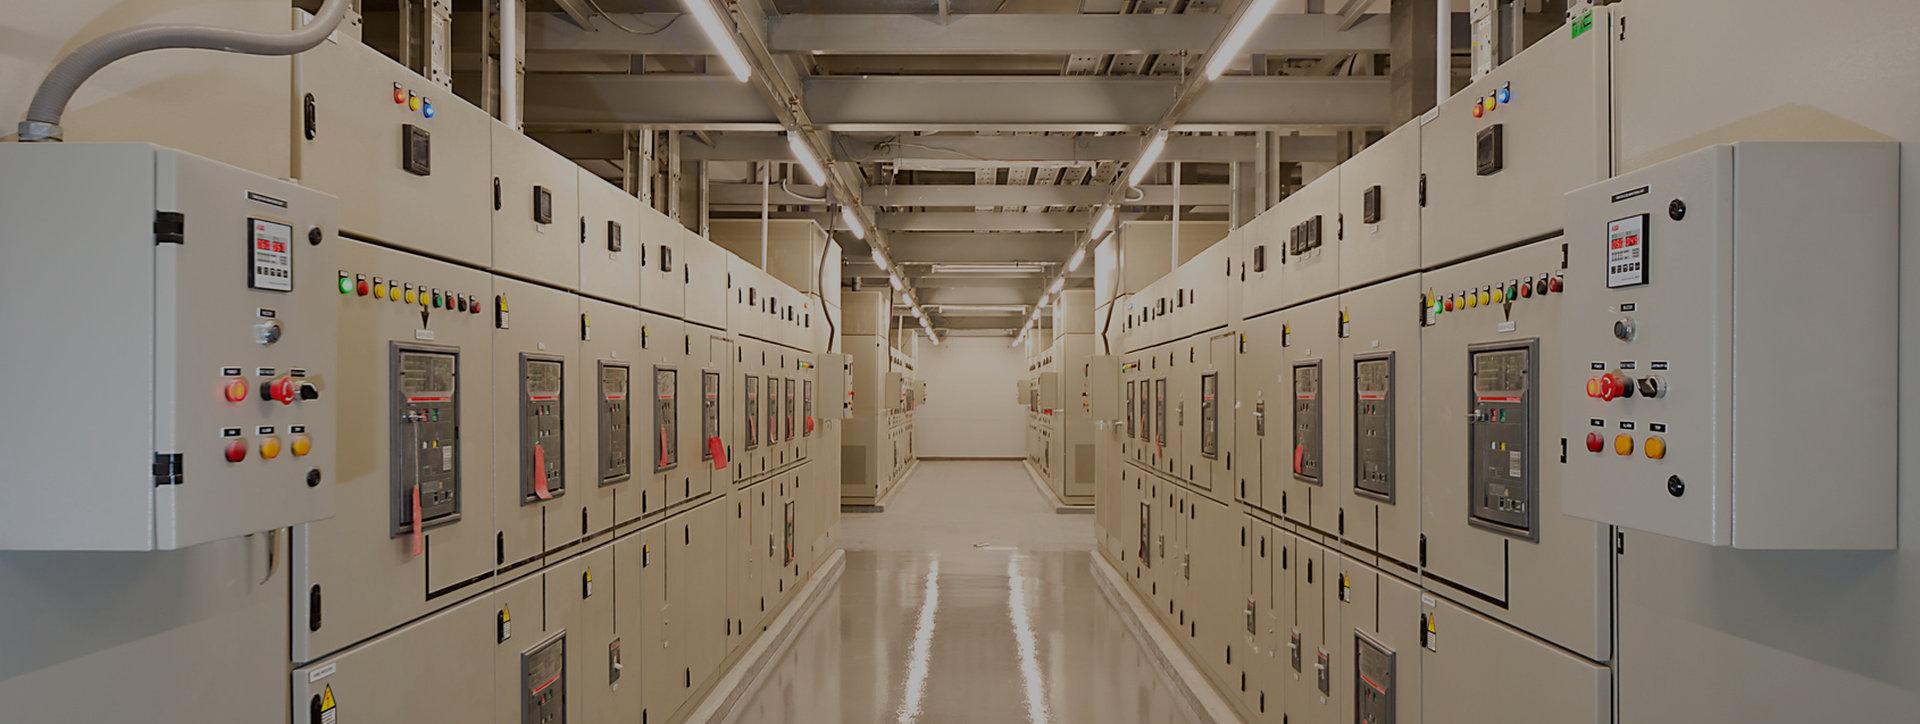 Elektrotechnika i automatyka